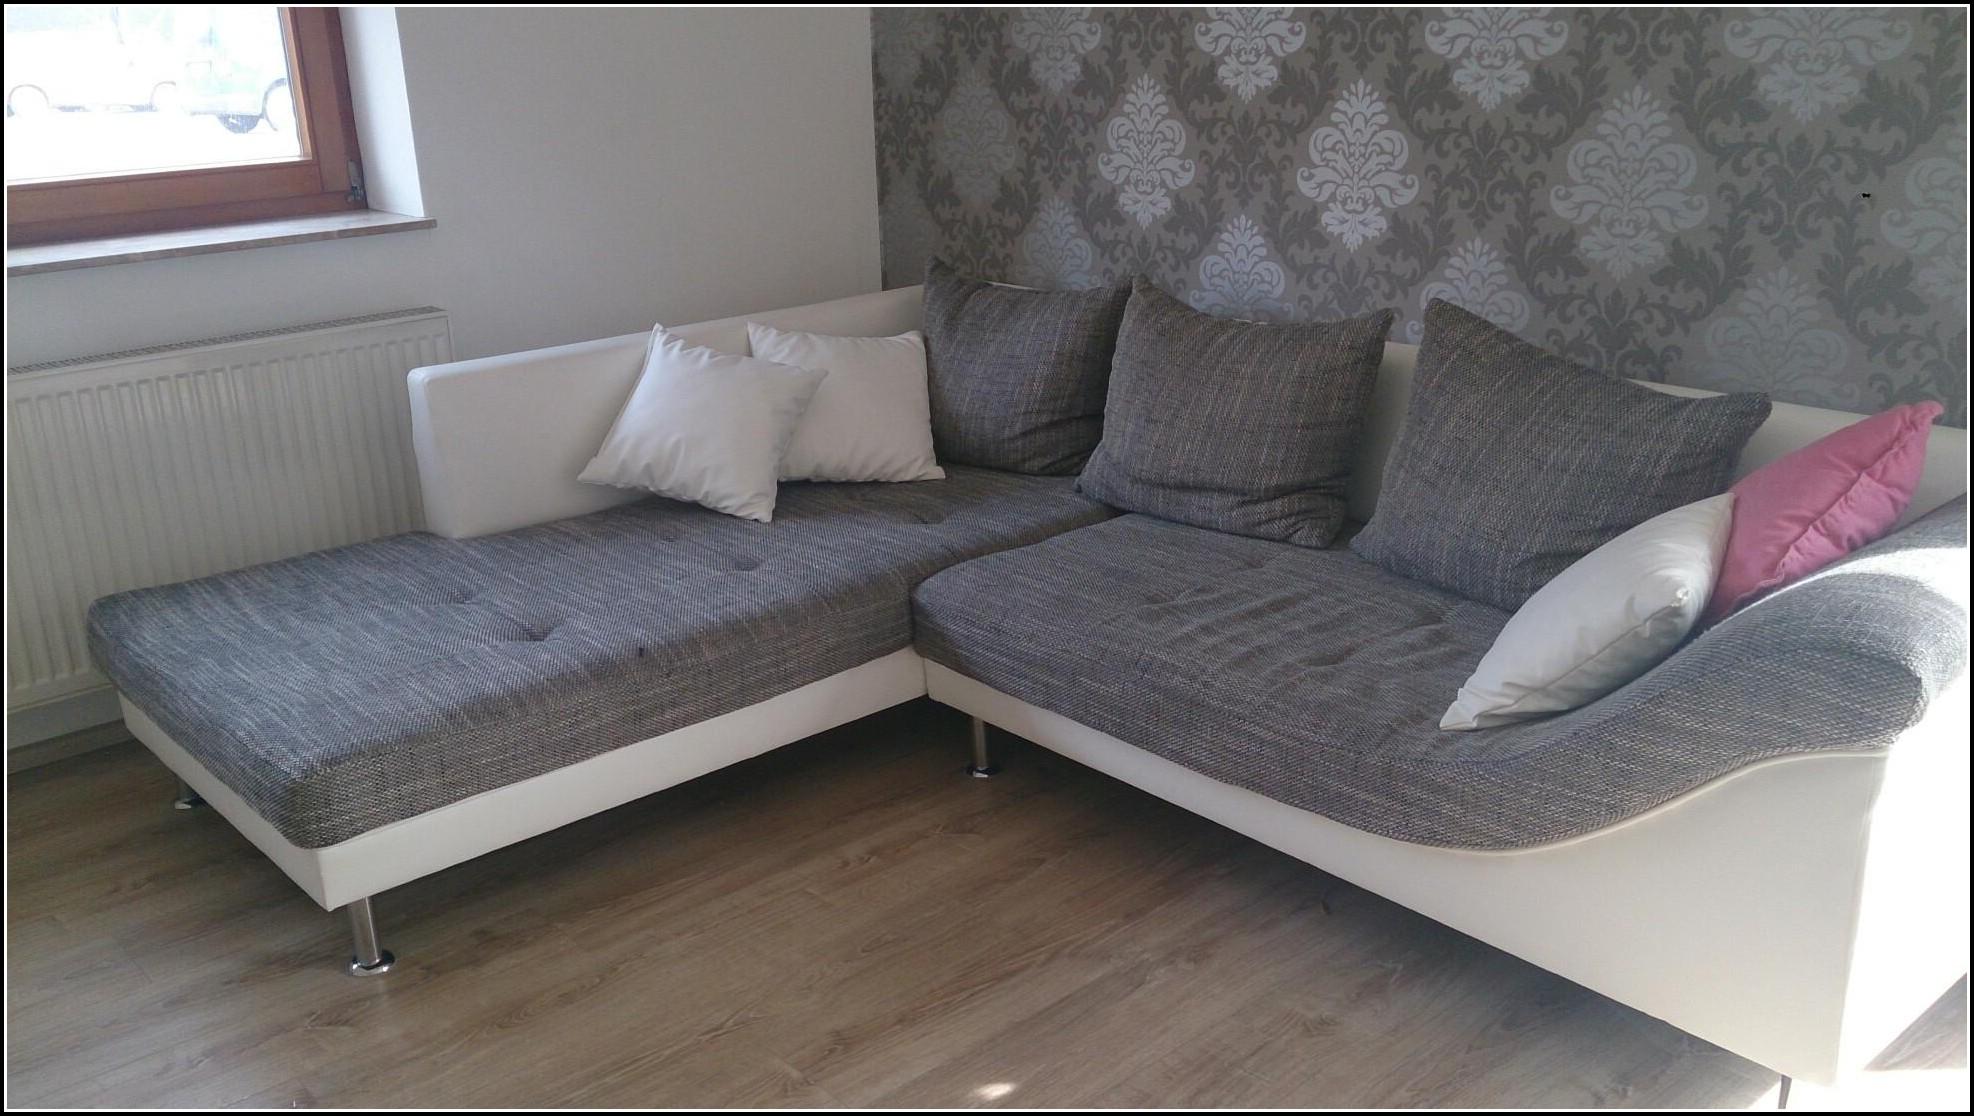 sch ne sofas krefeld sofas house und dekor galerie xgz104e1yj. Black Bedroom Furniture Sets. Home Design Ideas